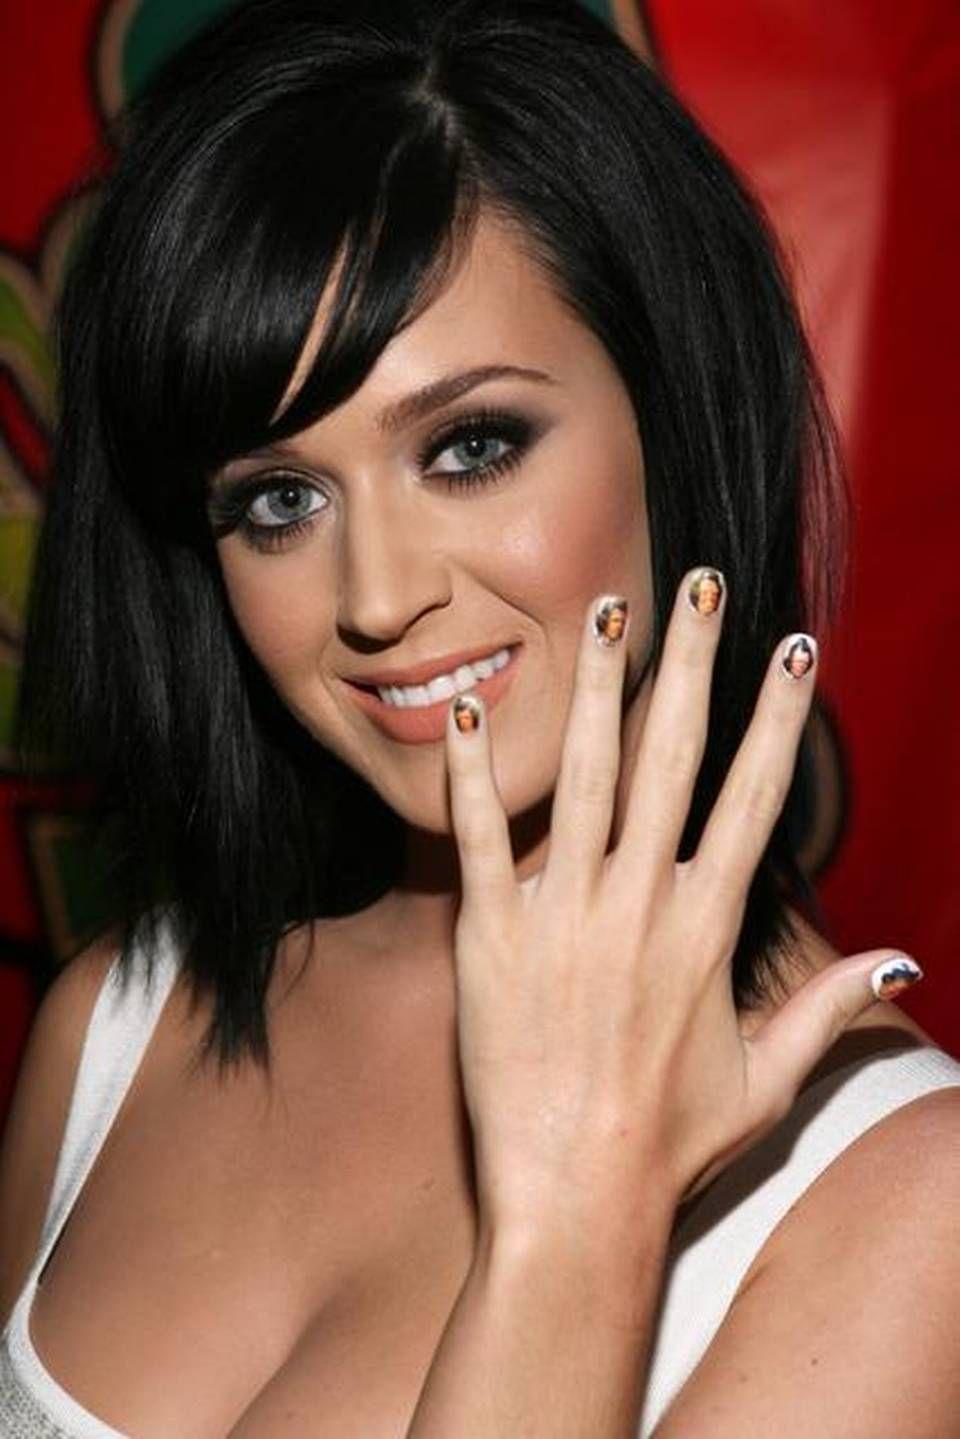 katy perry age Katy perry makeup, Eye makeup styles